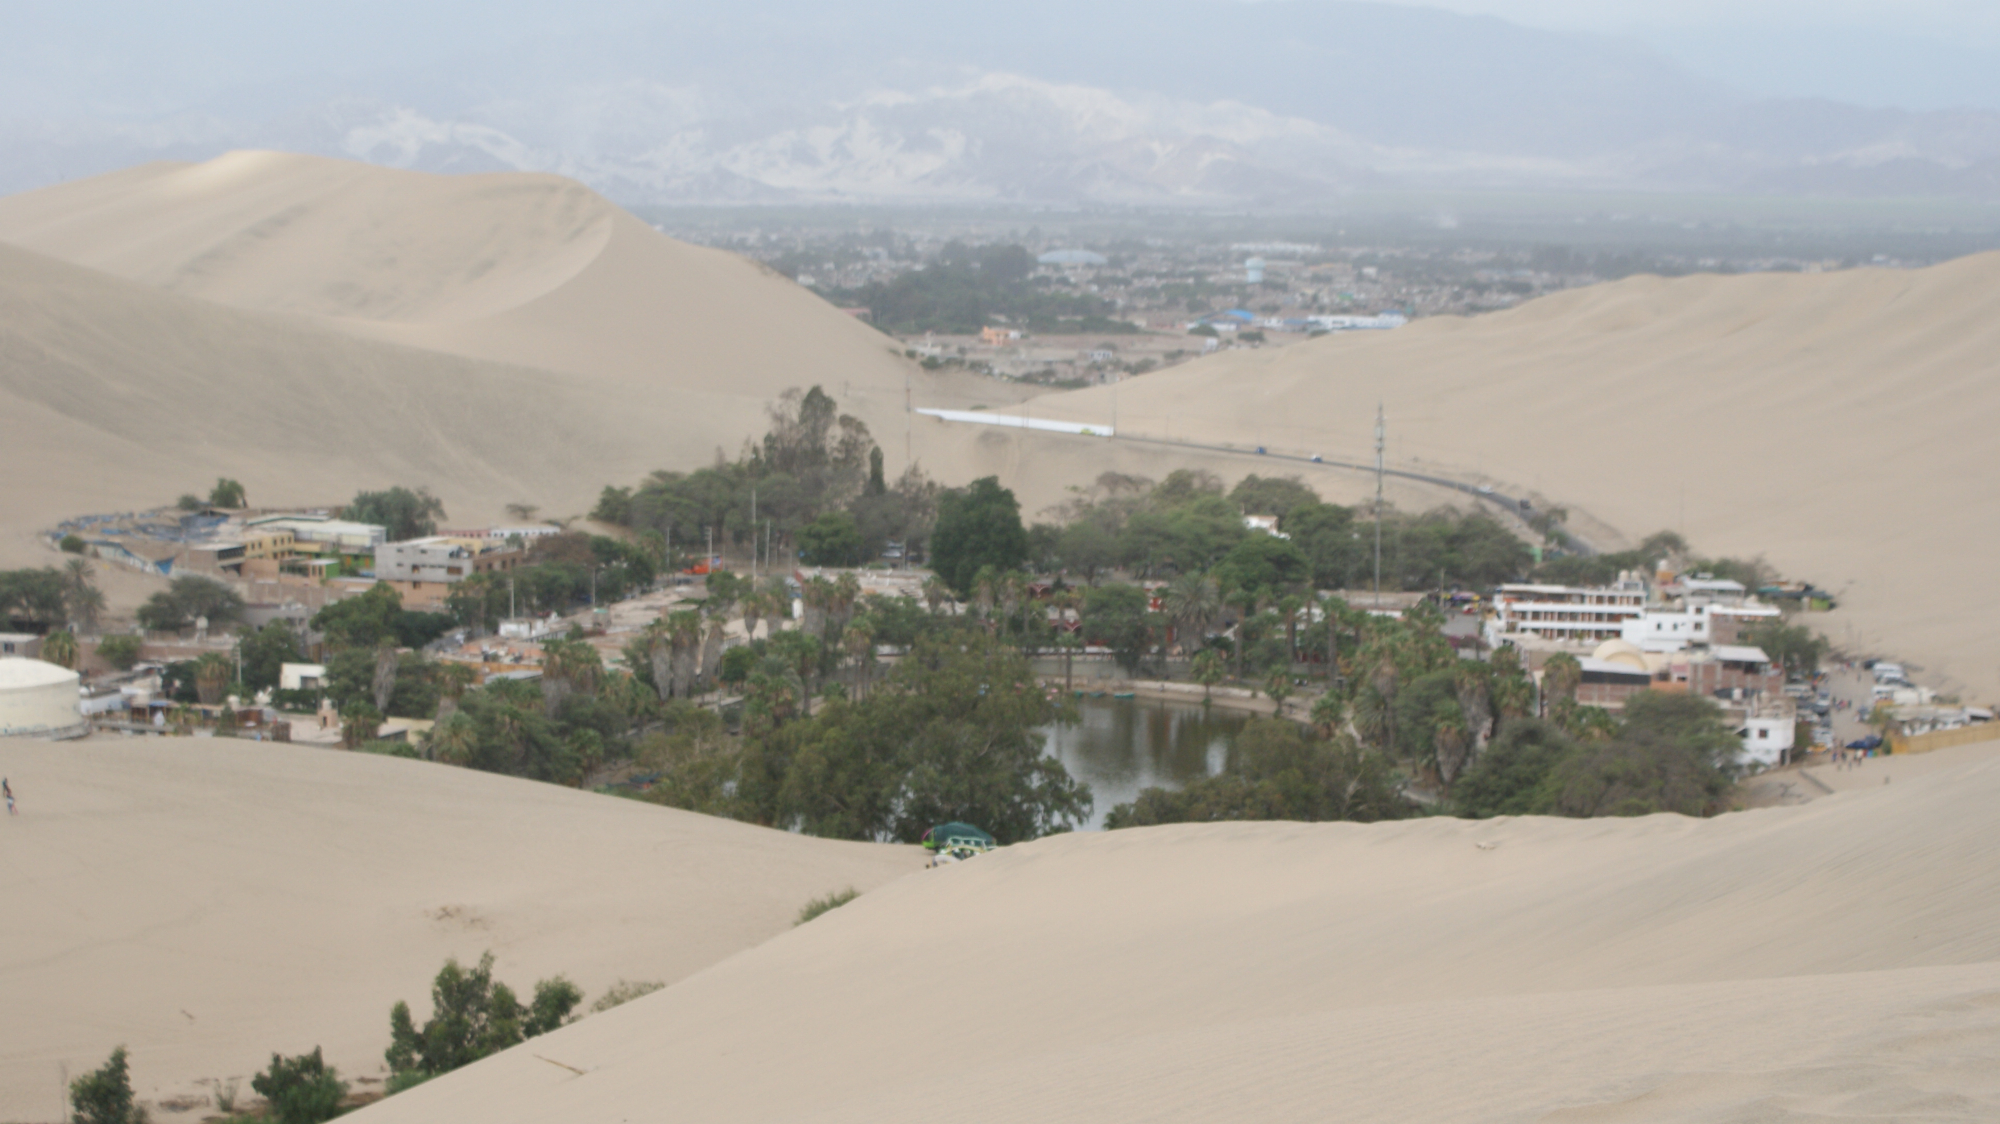 Peru sand dunes